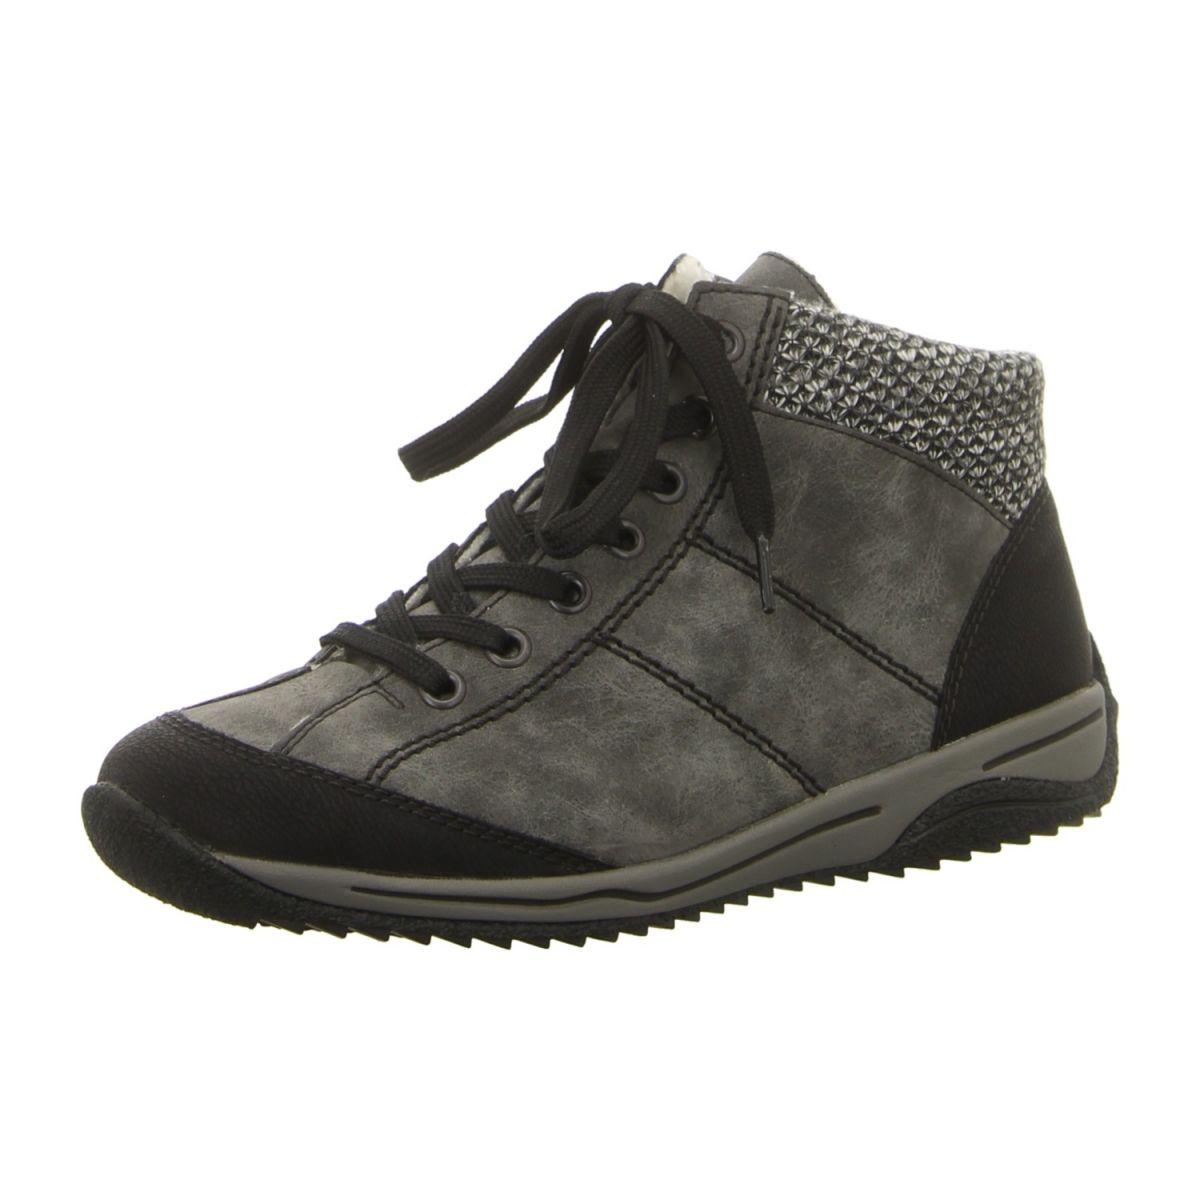 Rieker Schuhe Stiefelette 73222-45 grau kombi (grau) NEU